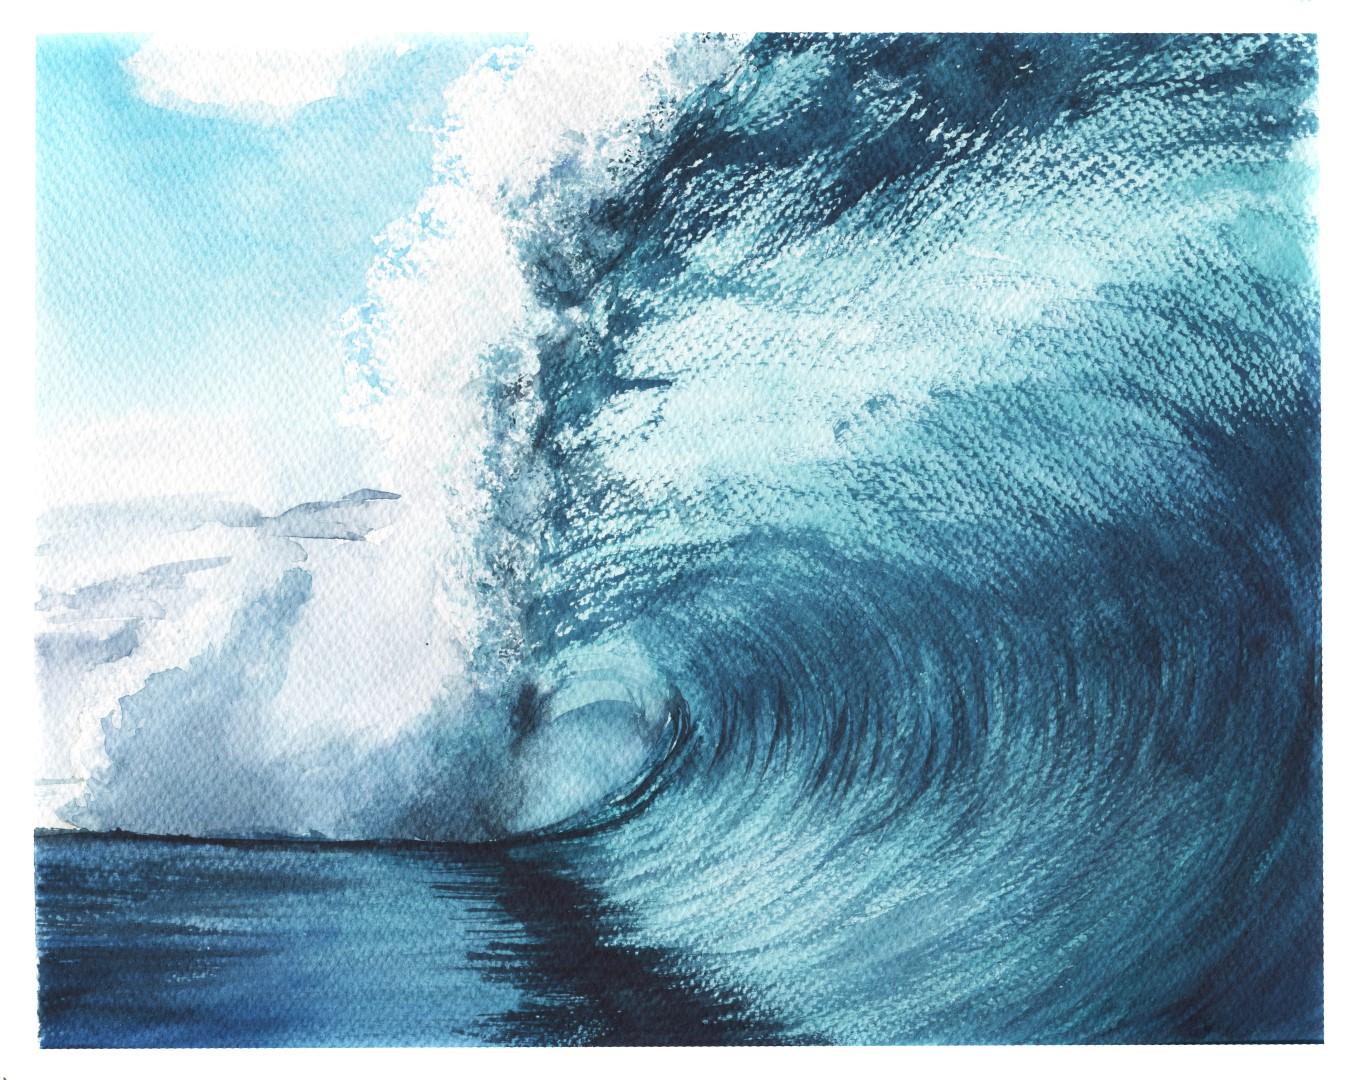 tidal-wave-2-Large.jpg